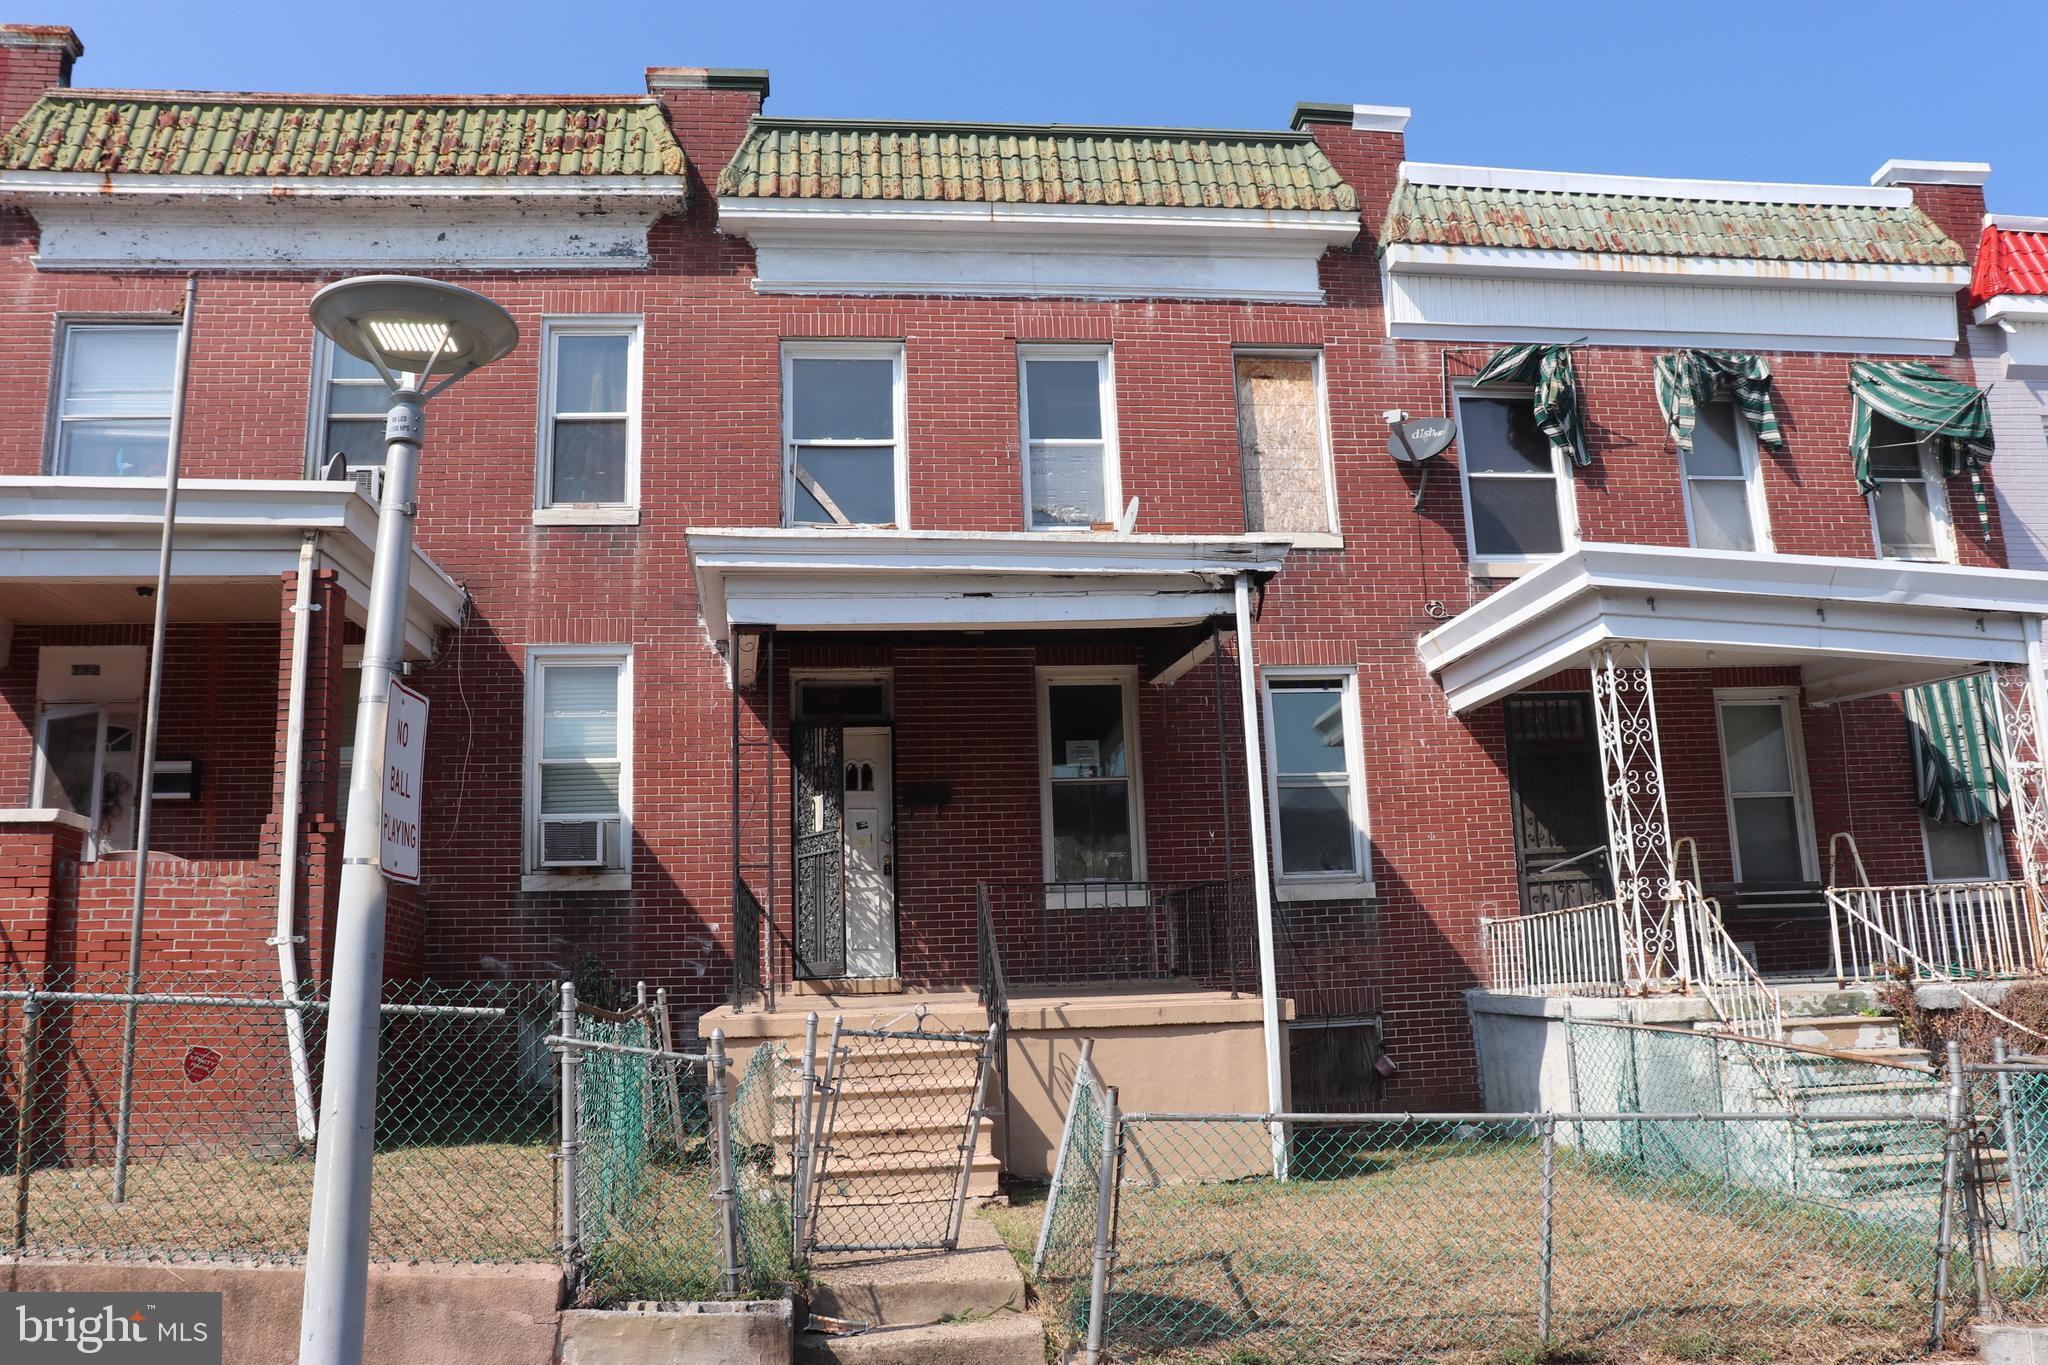 734 EDGEWOOD St N, Baltimore, MD, 21229